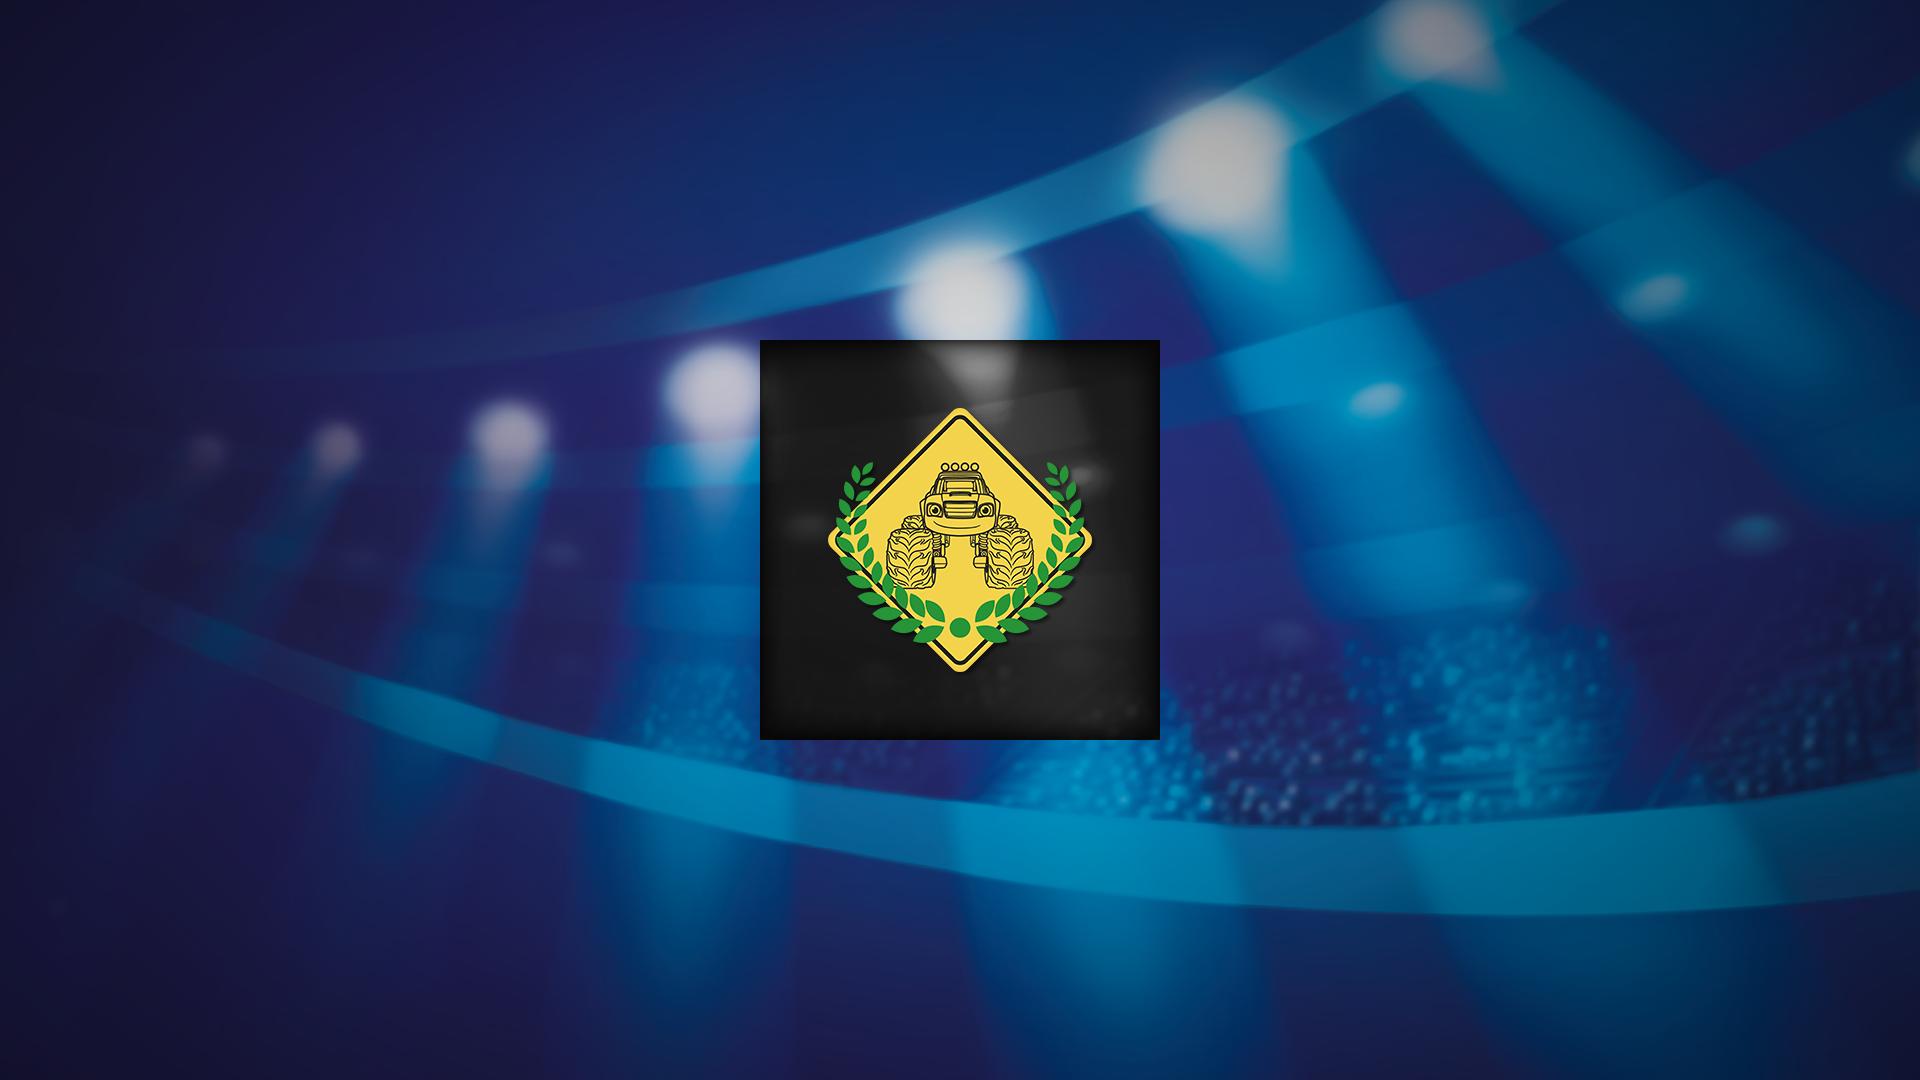 Icon for Axle City champion